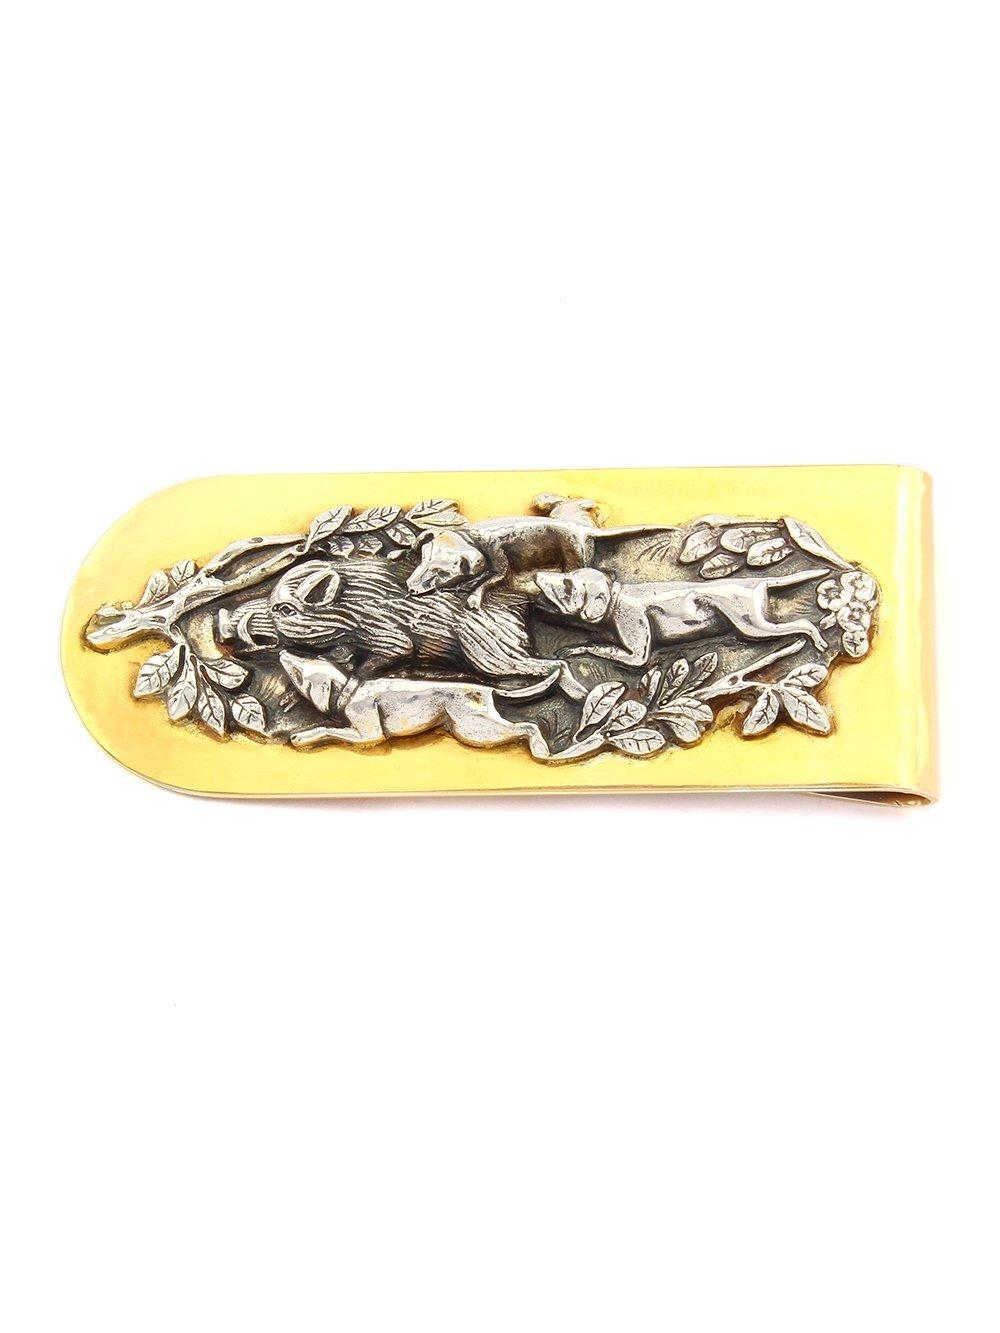 Silver Banknote clip Money clip ''Hunting''